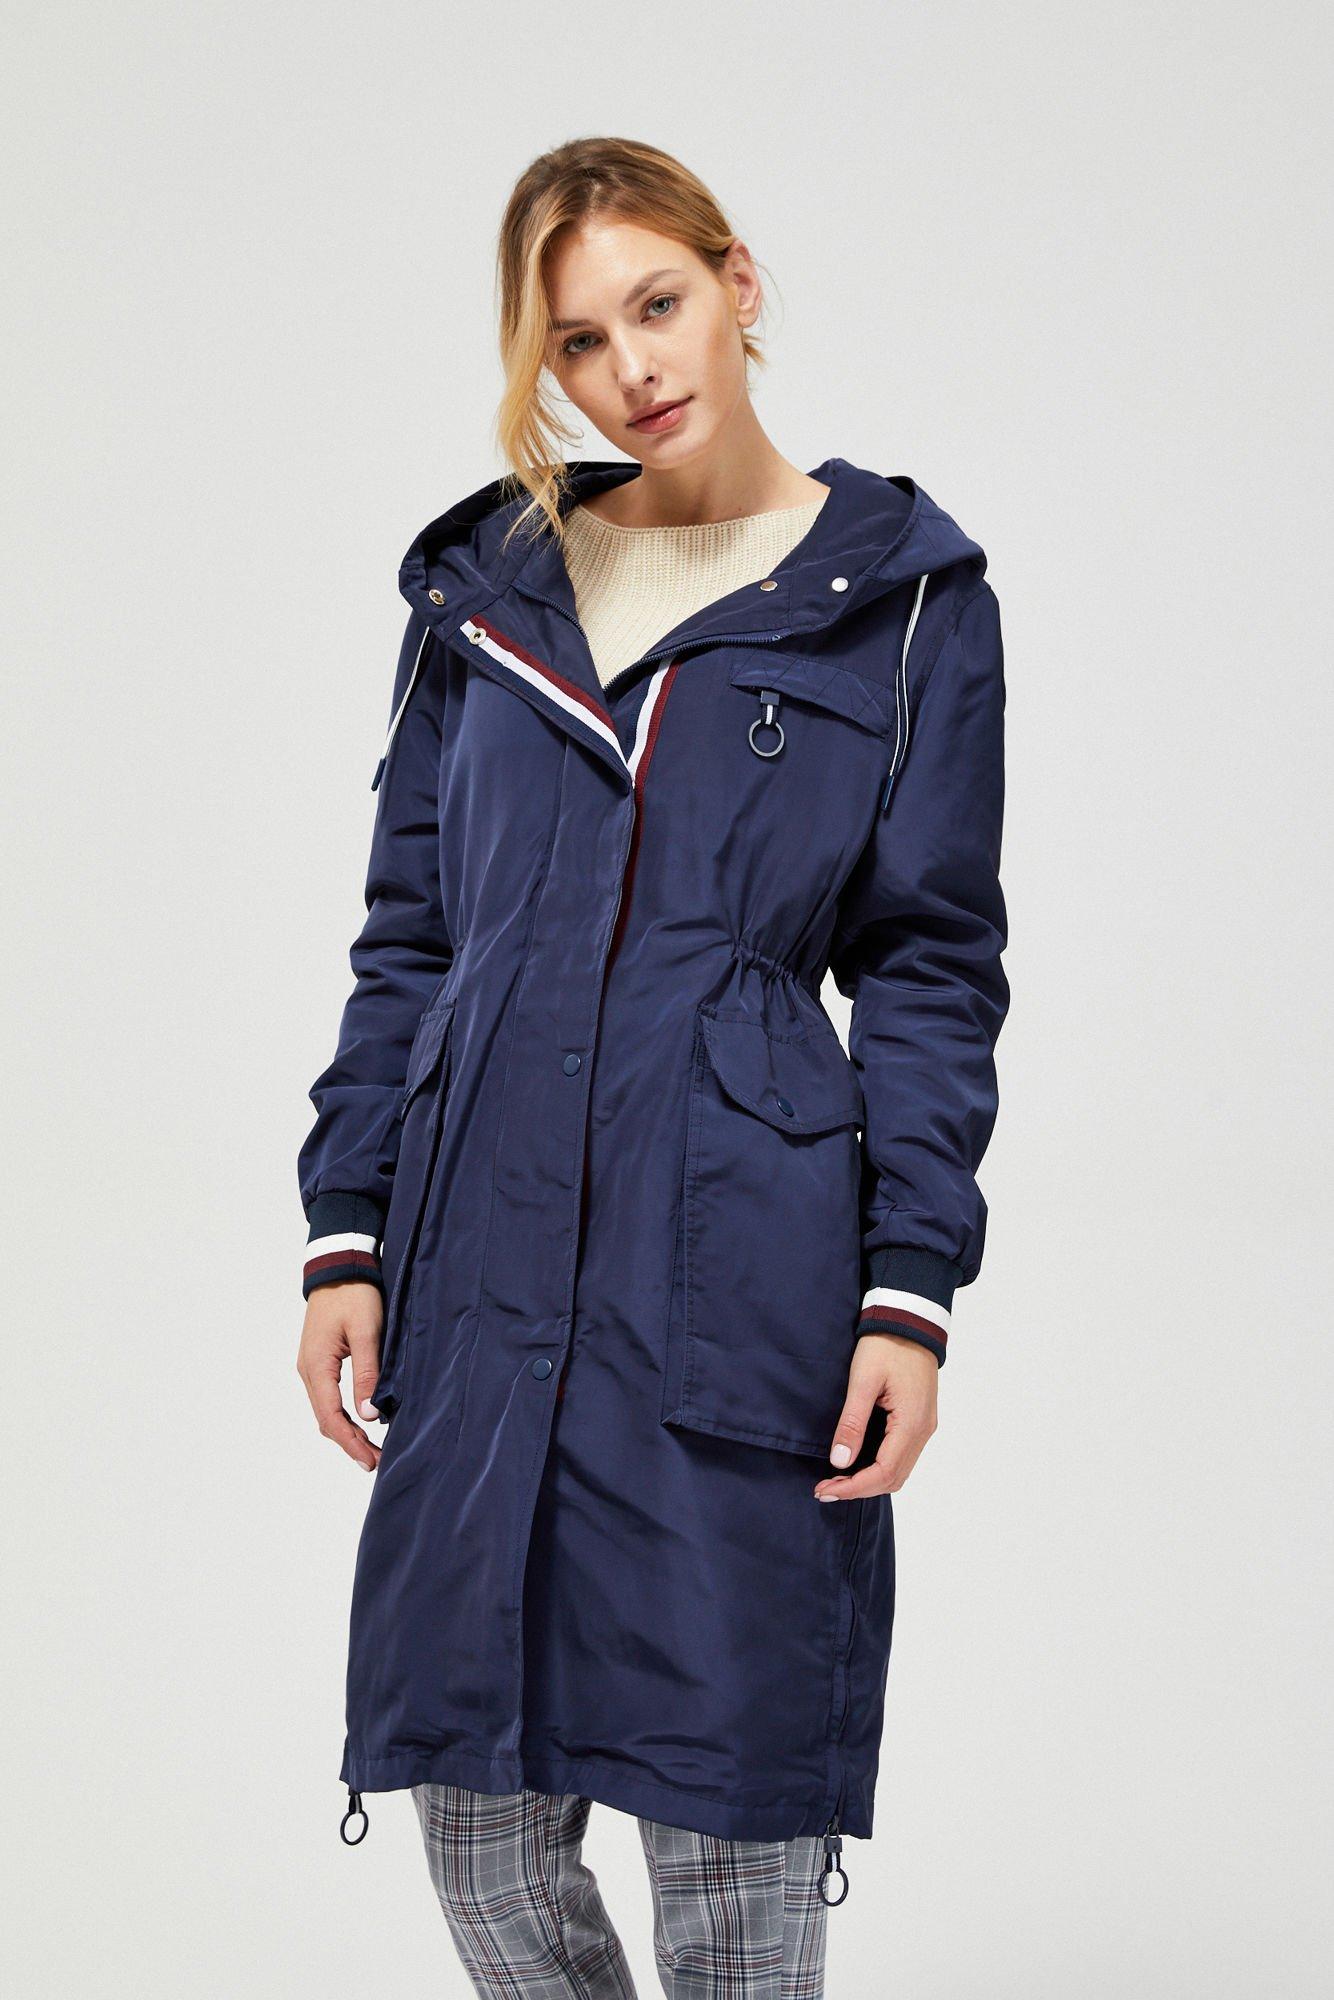 Długa kurtka z kapturem i rozporkami